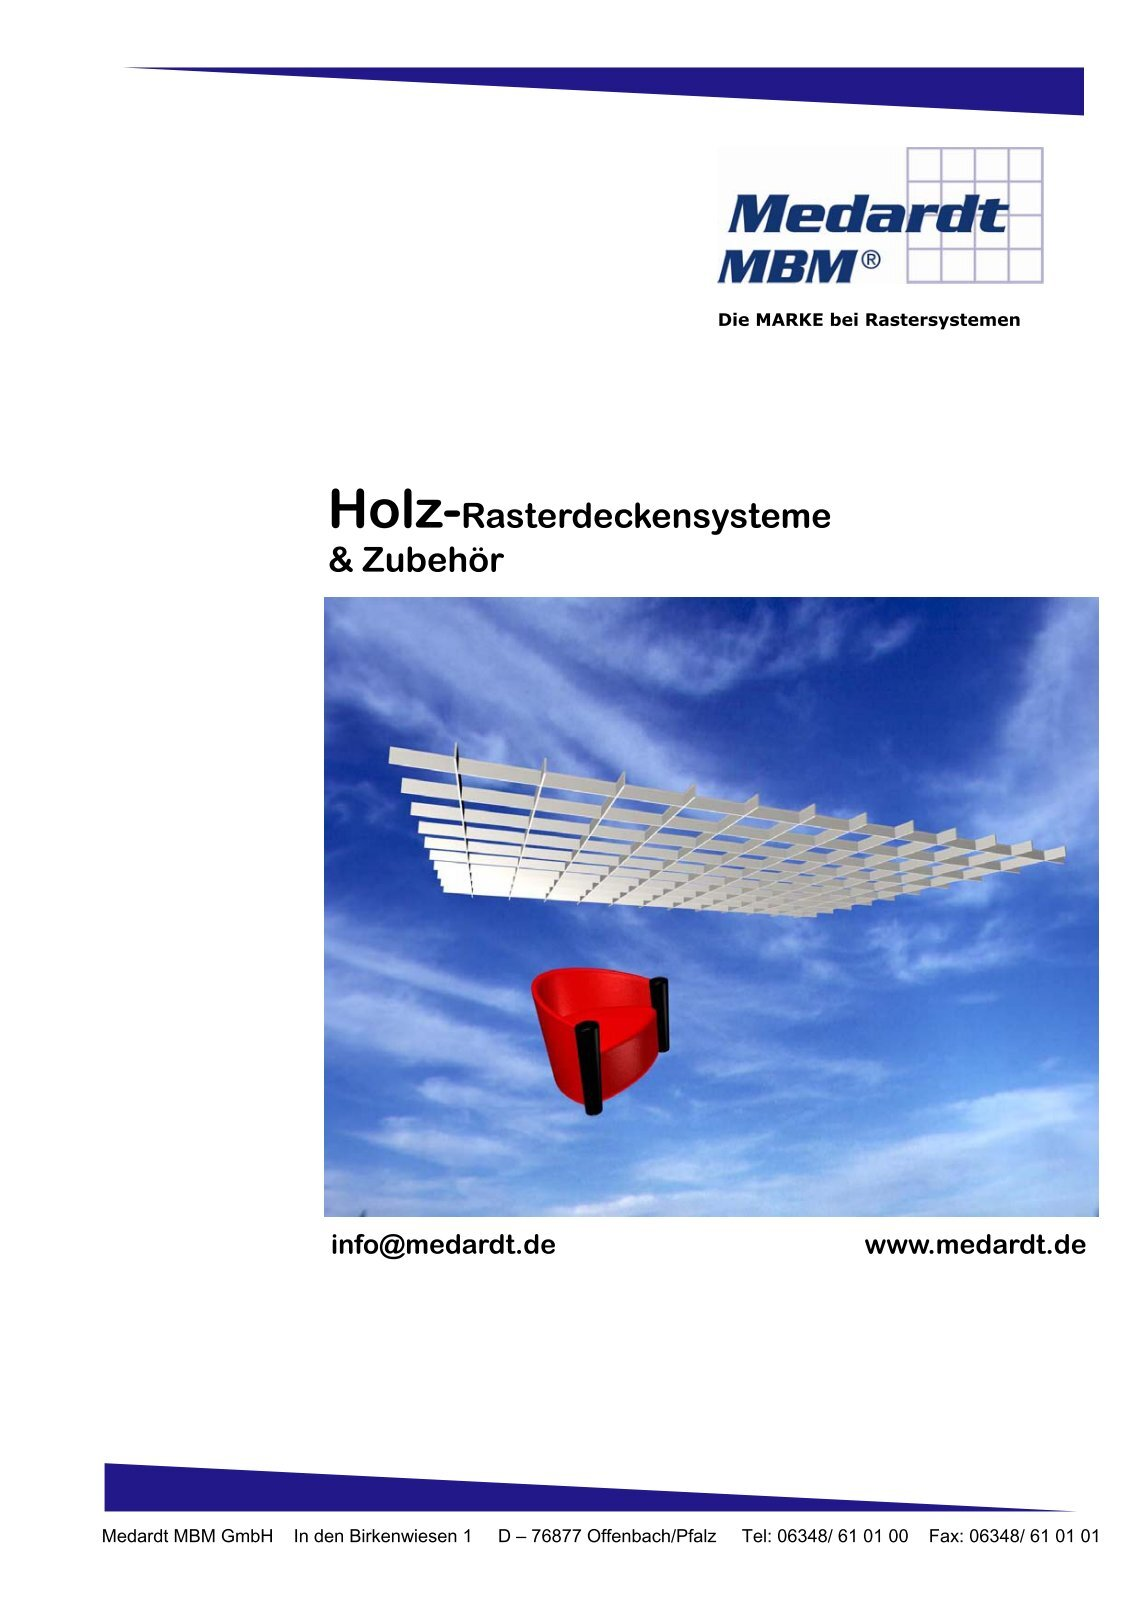 Ziemlich Metall Mbm Galerie - Innenarchitektur-Kollektion - seomx.info